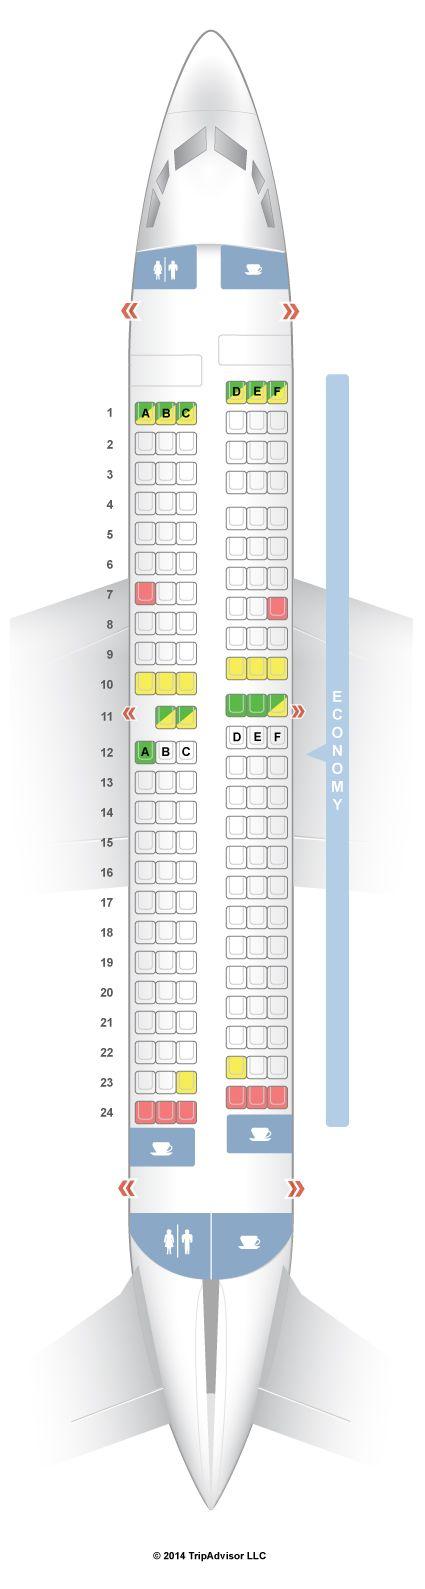 SeatGuru Seat Map Southwest Boeing 737-700 (737)